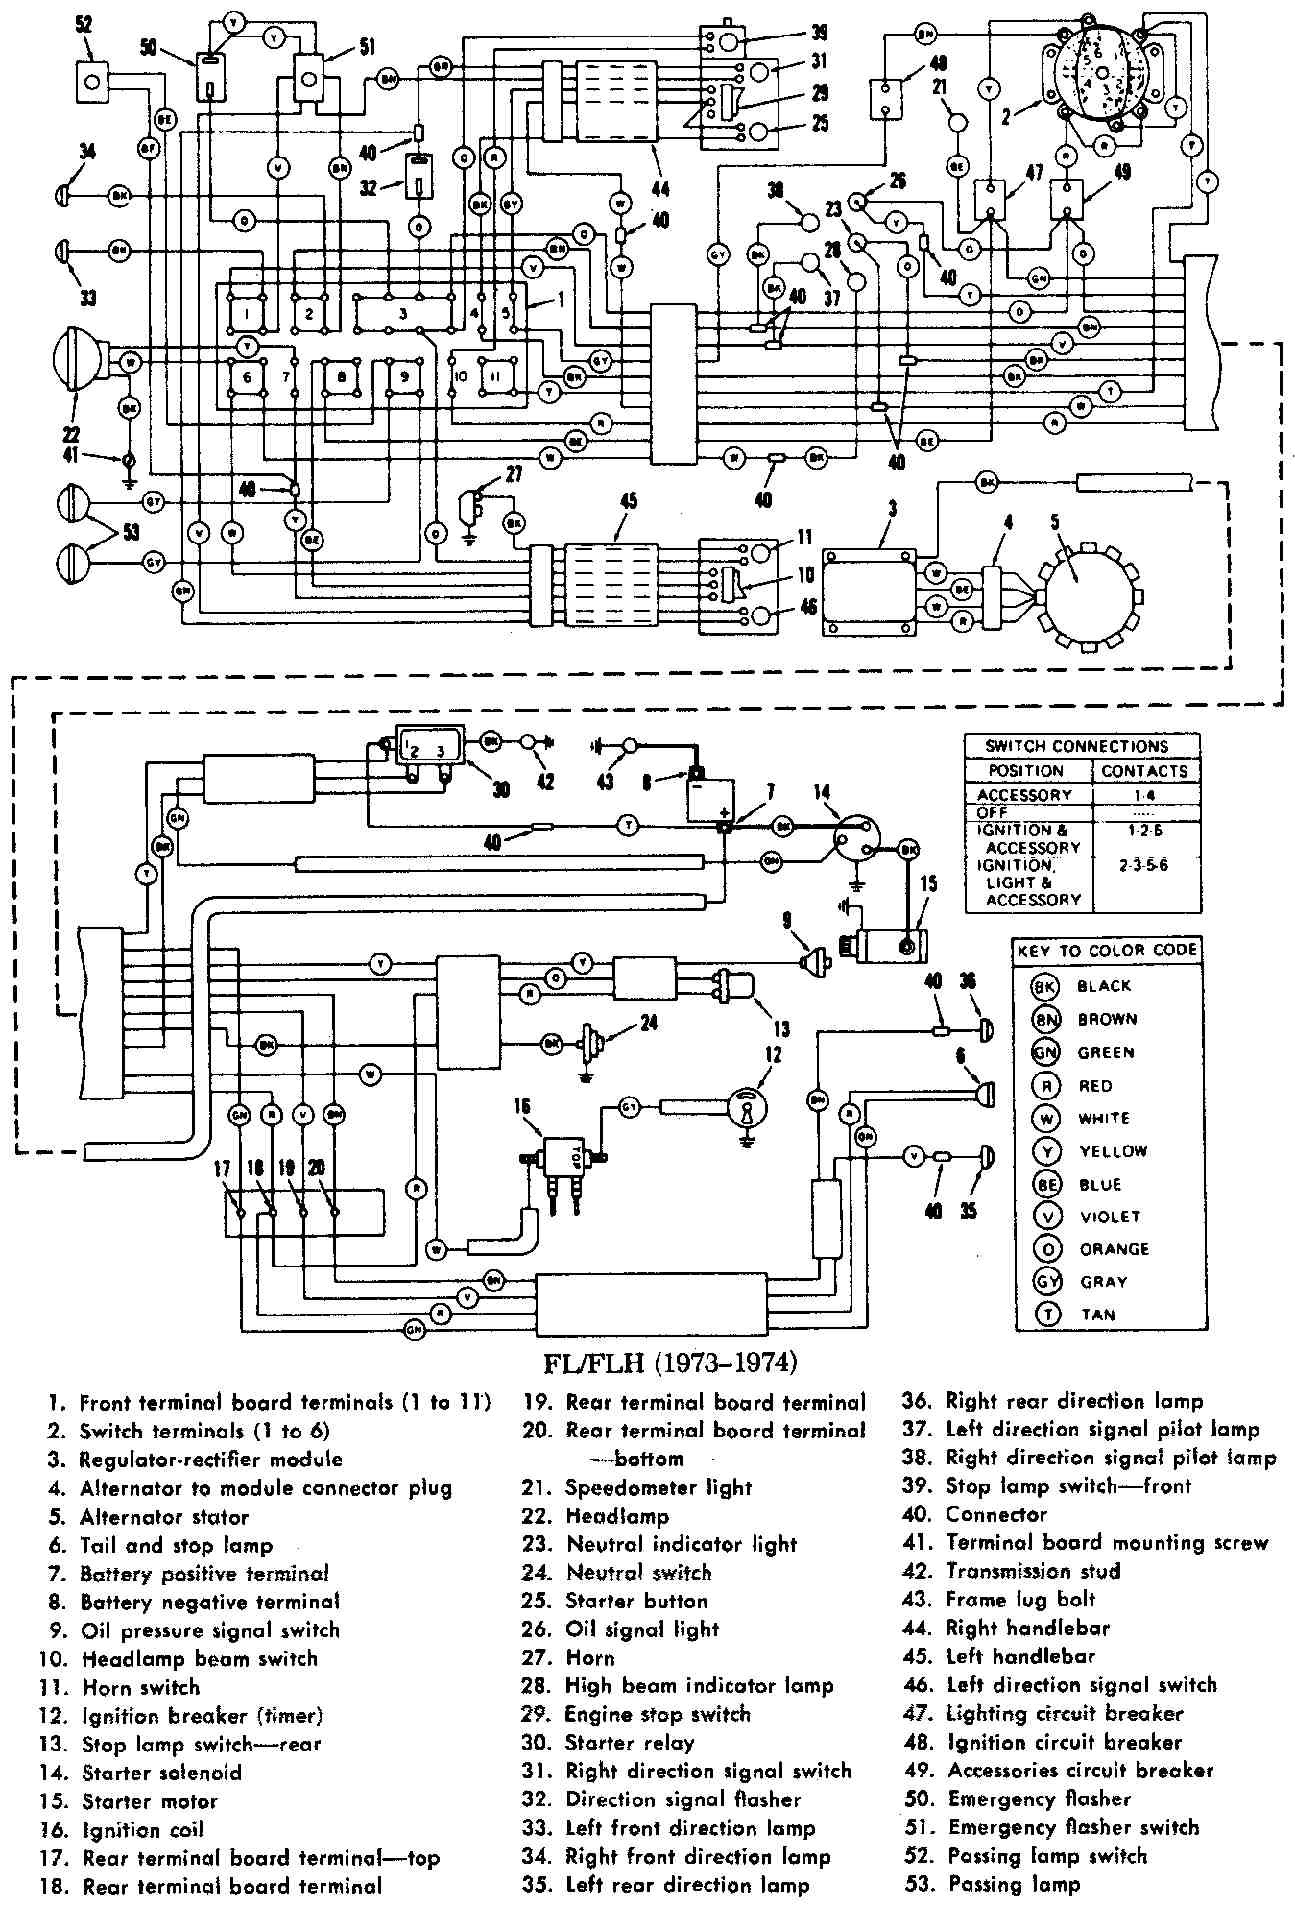 hight resolution of harley wiring diagram wires detailed schematics diagram harley throttle by wire diagram harley starter relay wiring